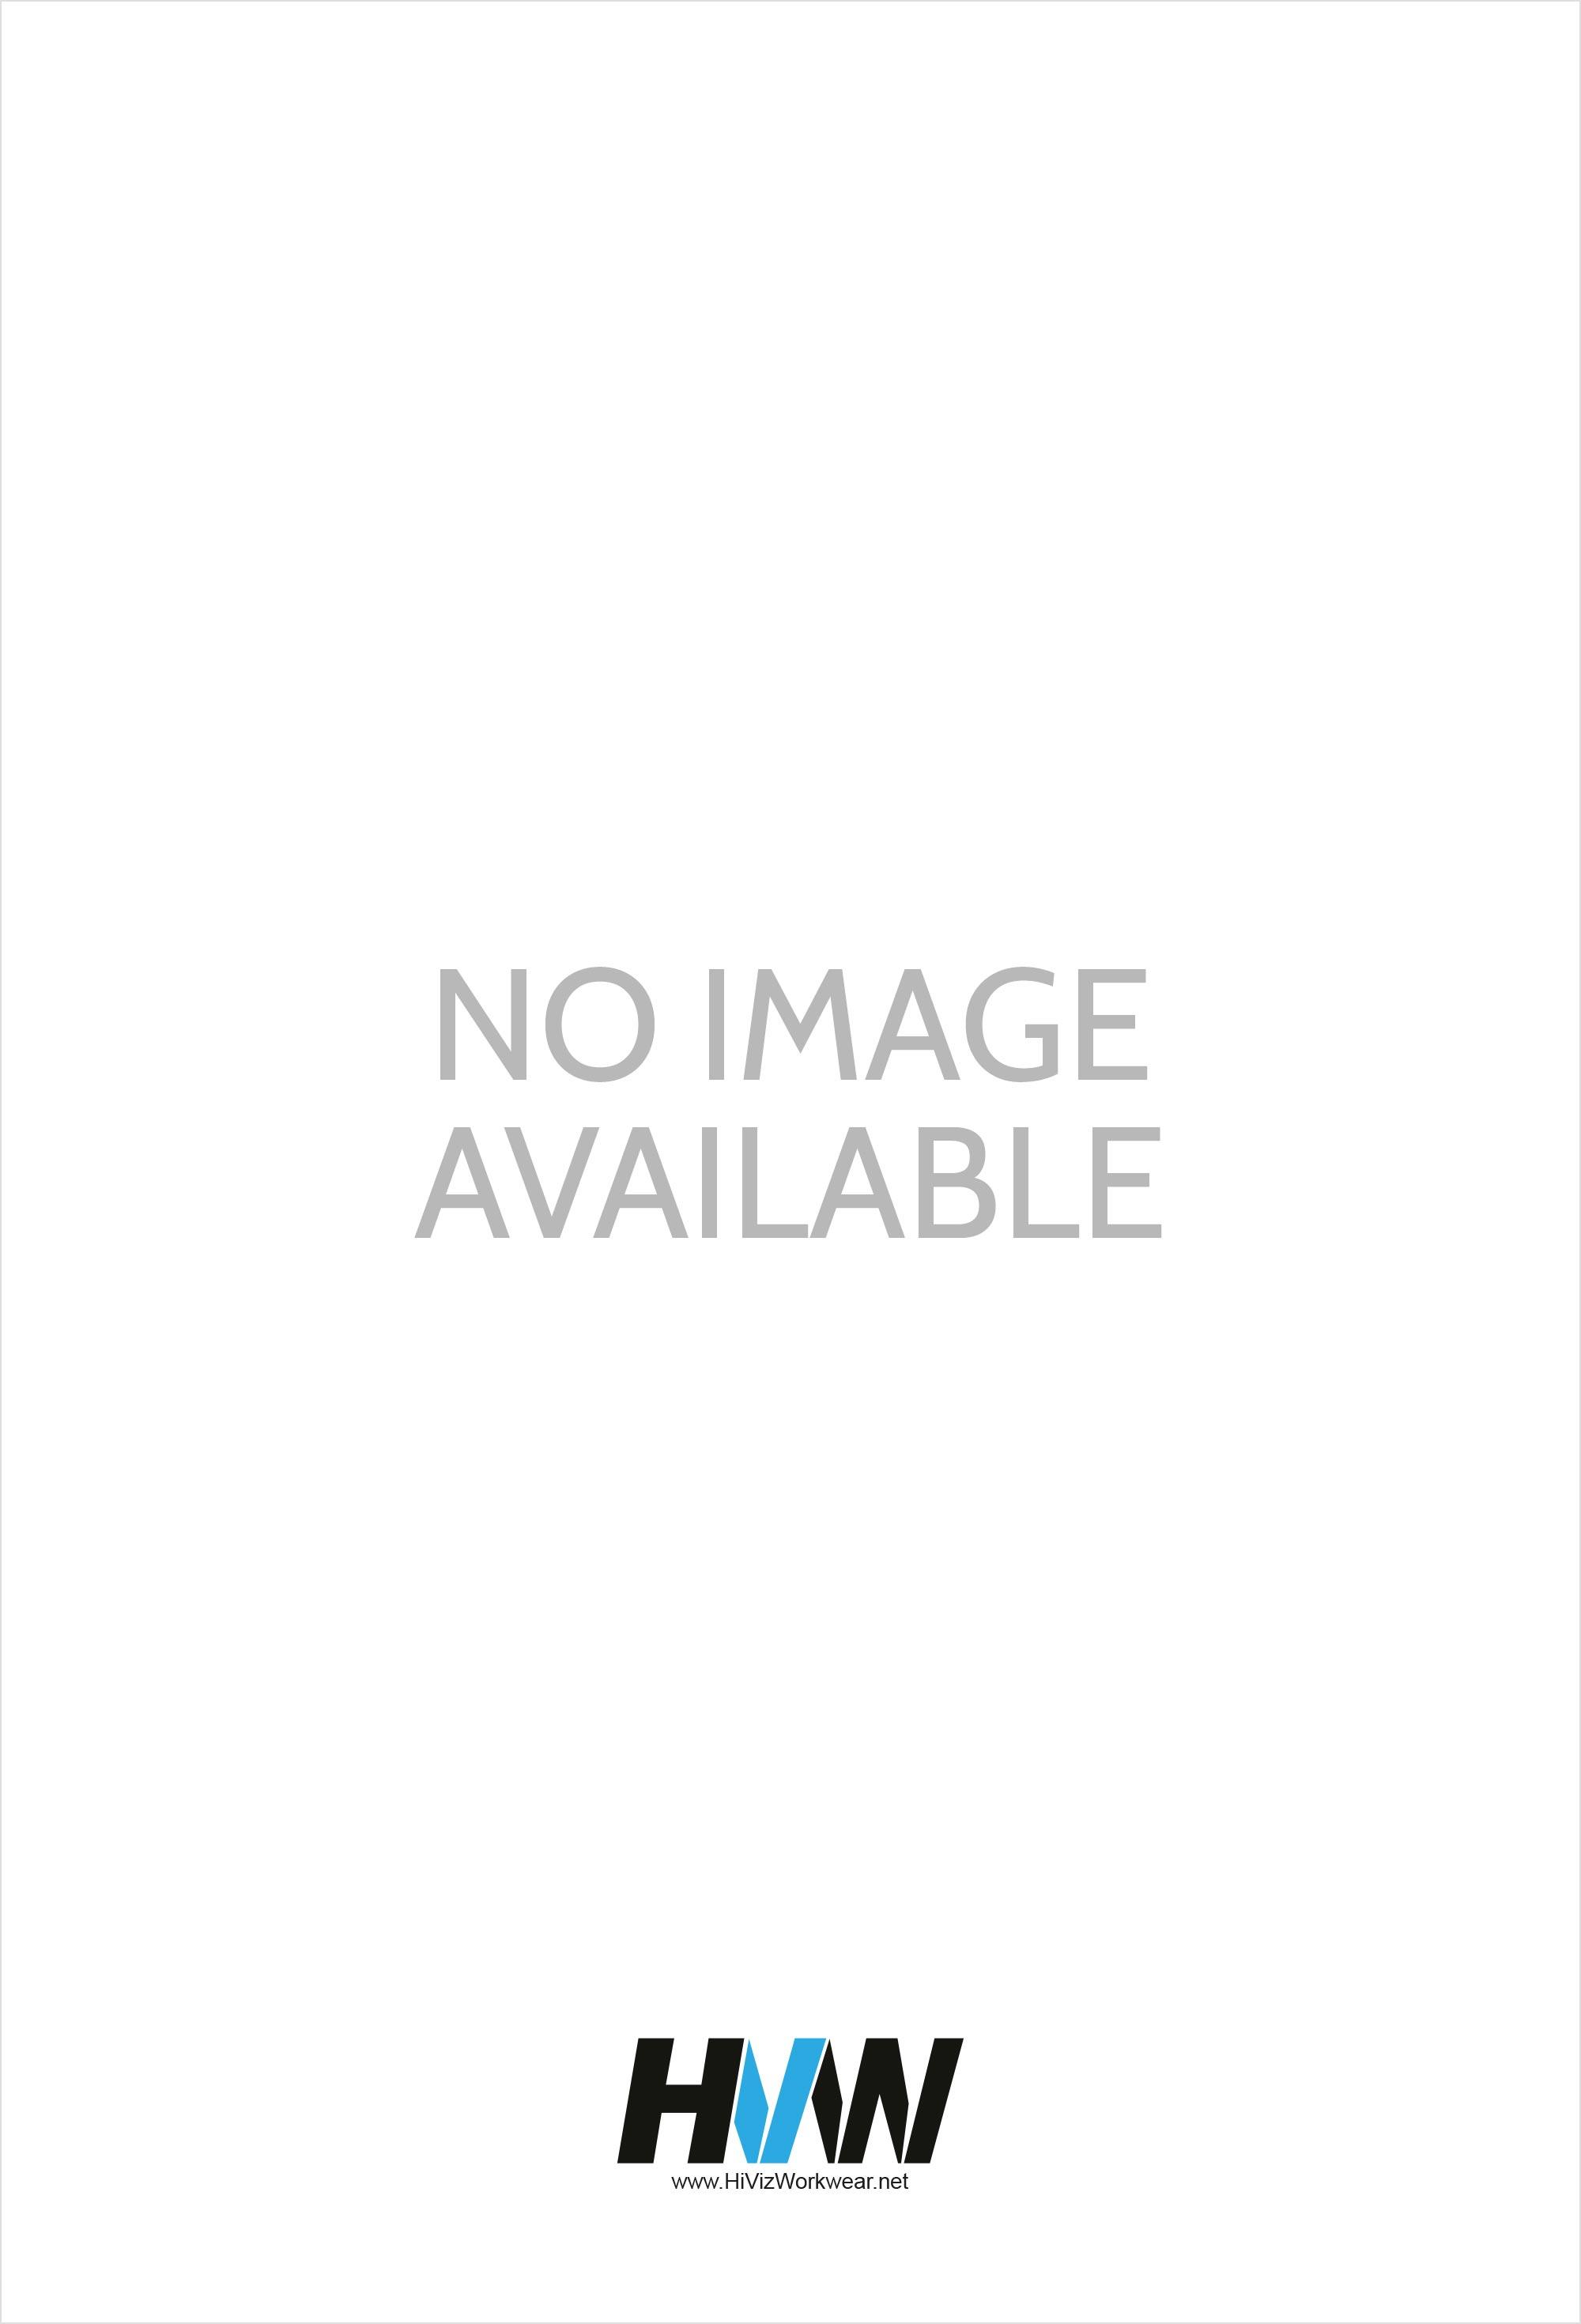 SS026 Short Sleeved BaseBall T-Shirt (Small To 2XL)